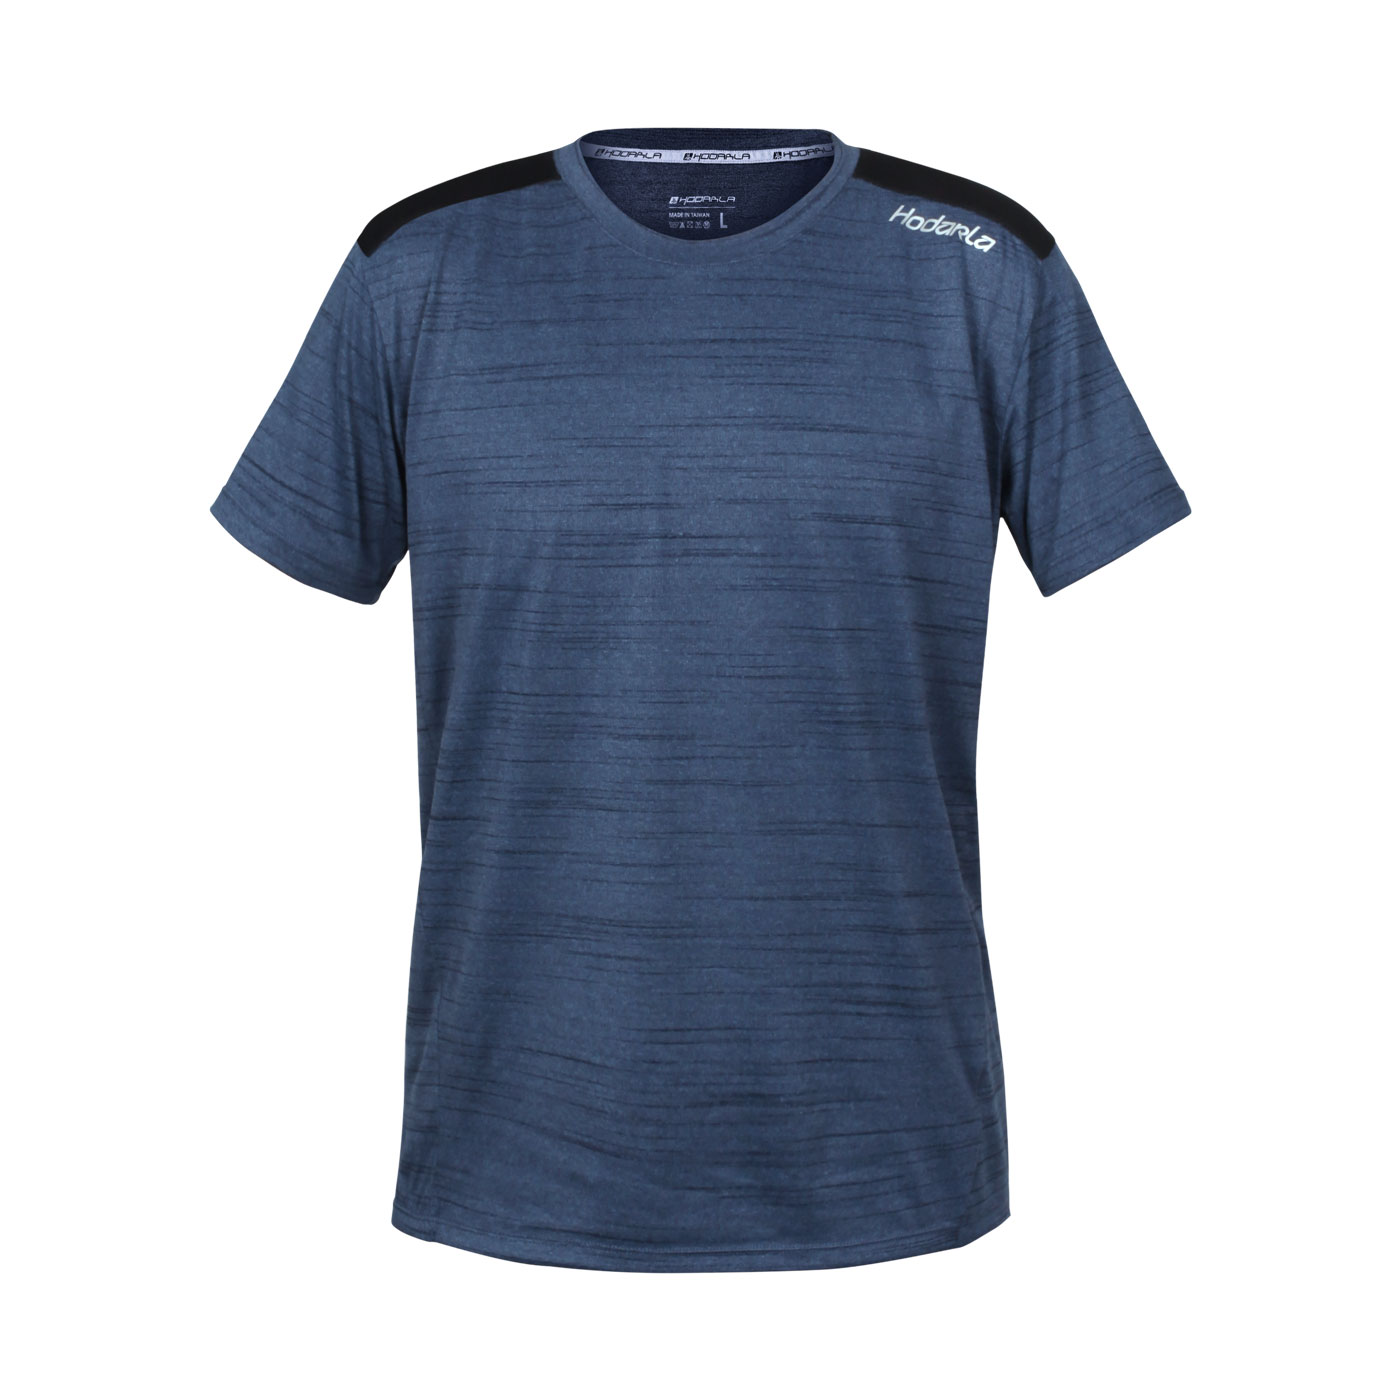 HODARLA 躍動剪接短袖圓領衫 3162501 - 麻花藍